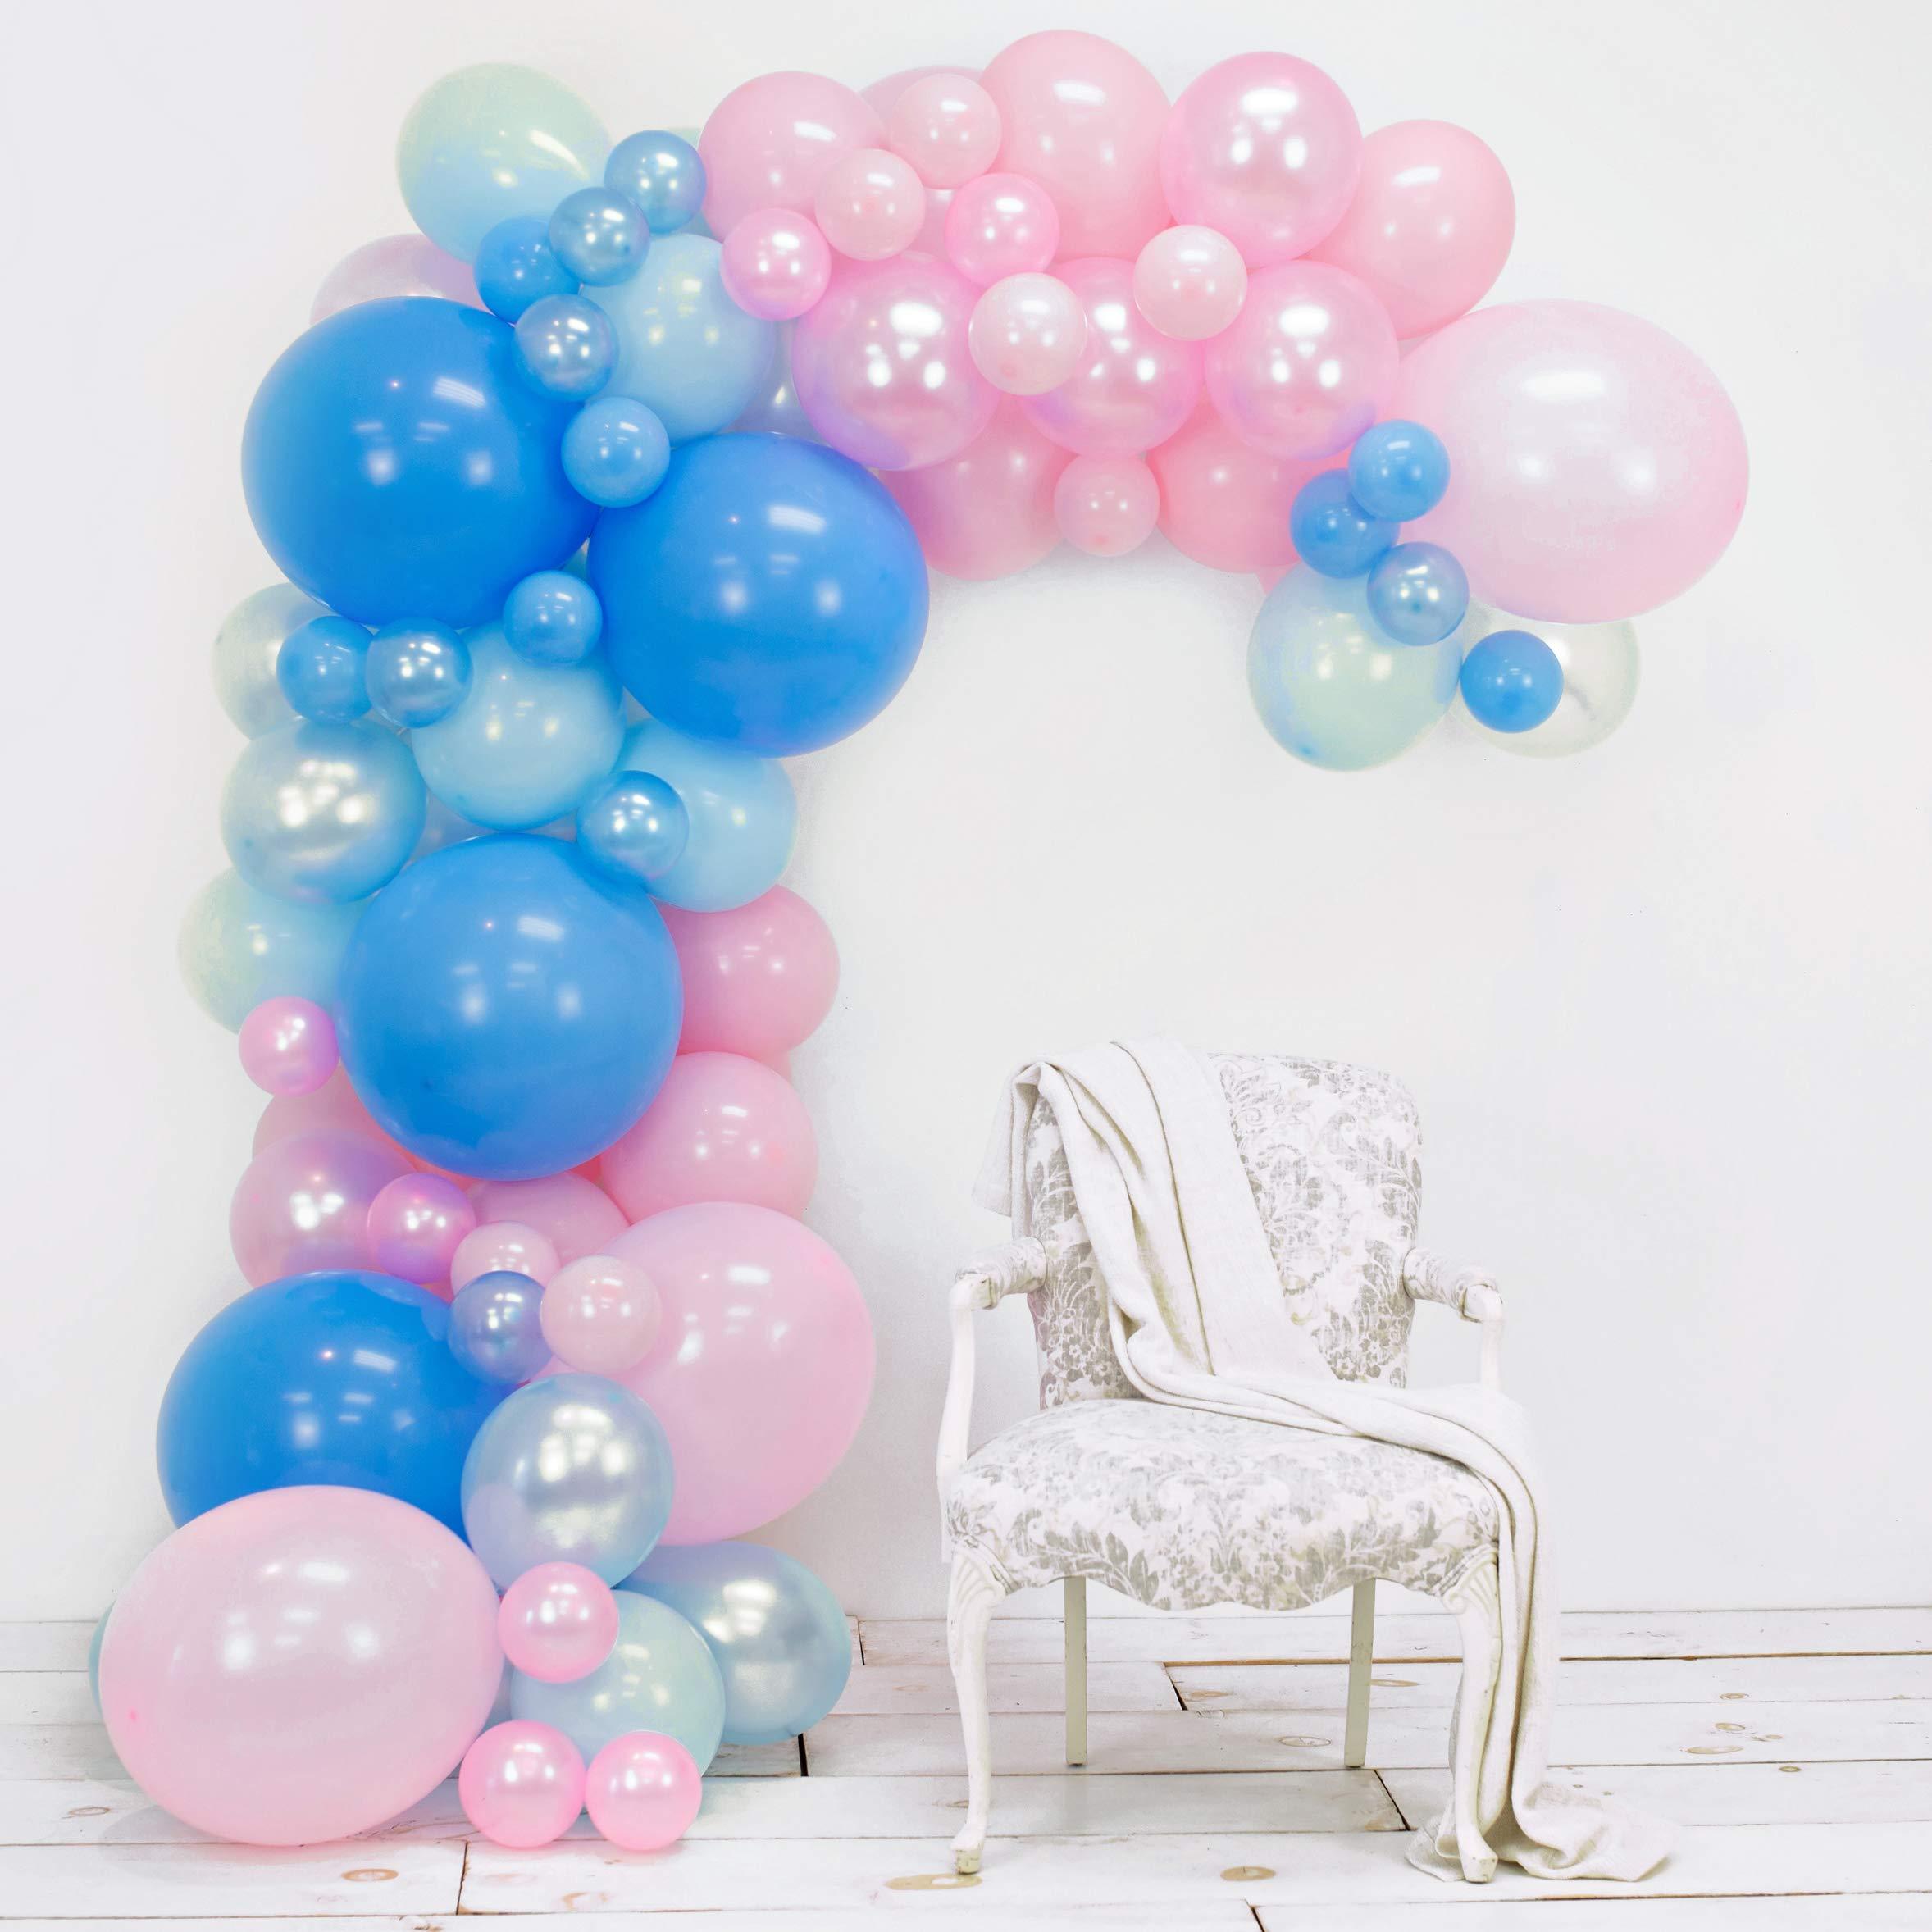 Junibel Balloon Arch & Garland Kit   Blue & Pink Pearl & Latex Balloons   Glue Dots & Decorating Strip   Gender Reveal, Wedding, Baby Shower, Graduation, Anniversary Organic Party Decorations